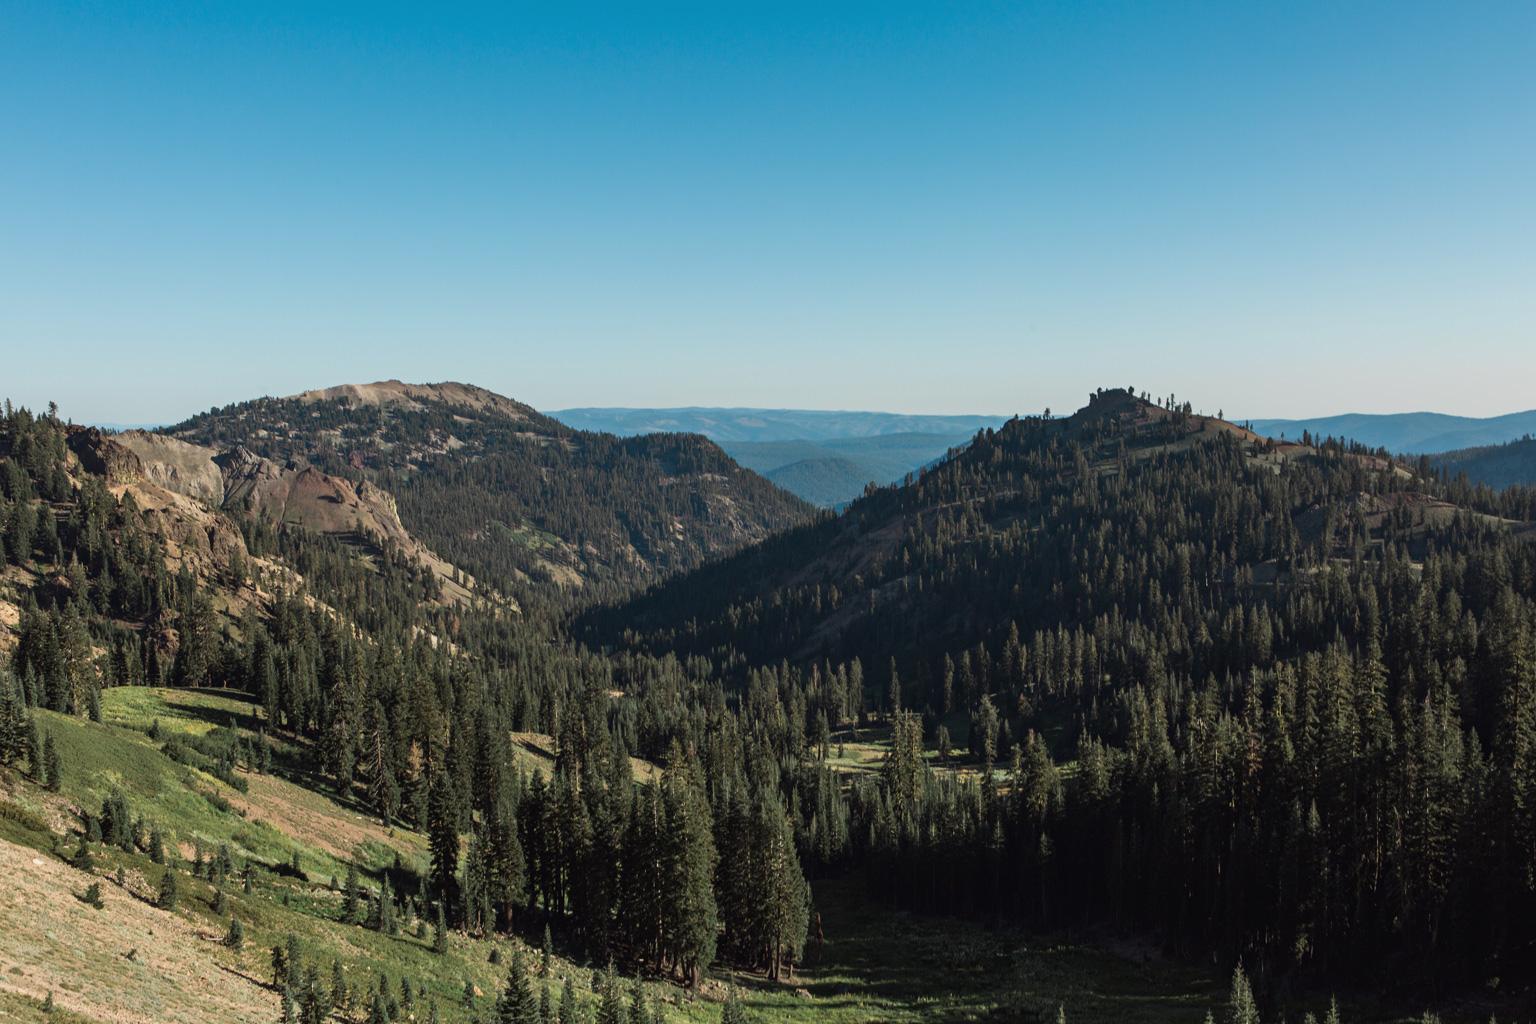 CindyGiovagnoli_Lassen_Volcanic_National_Park_California_camp_road_trip-006.jpg